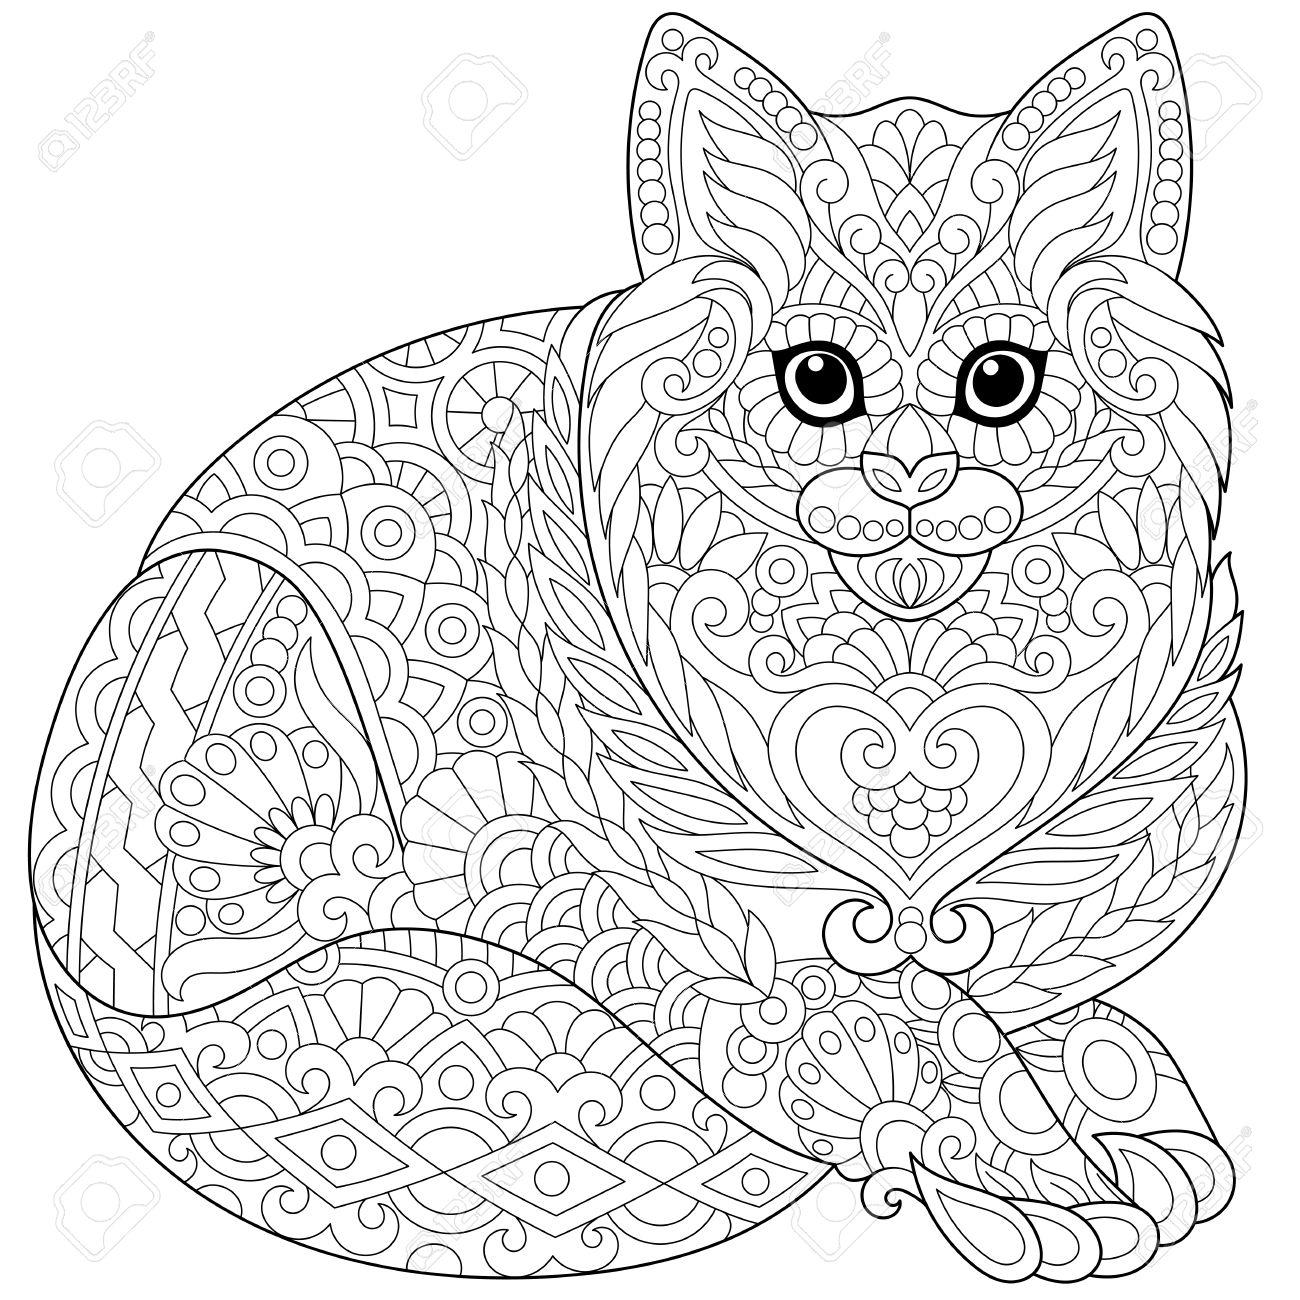 Gato Lindo Estilizado (gatito Joven). Boceto A Mano Alzada Para ...